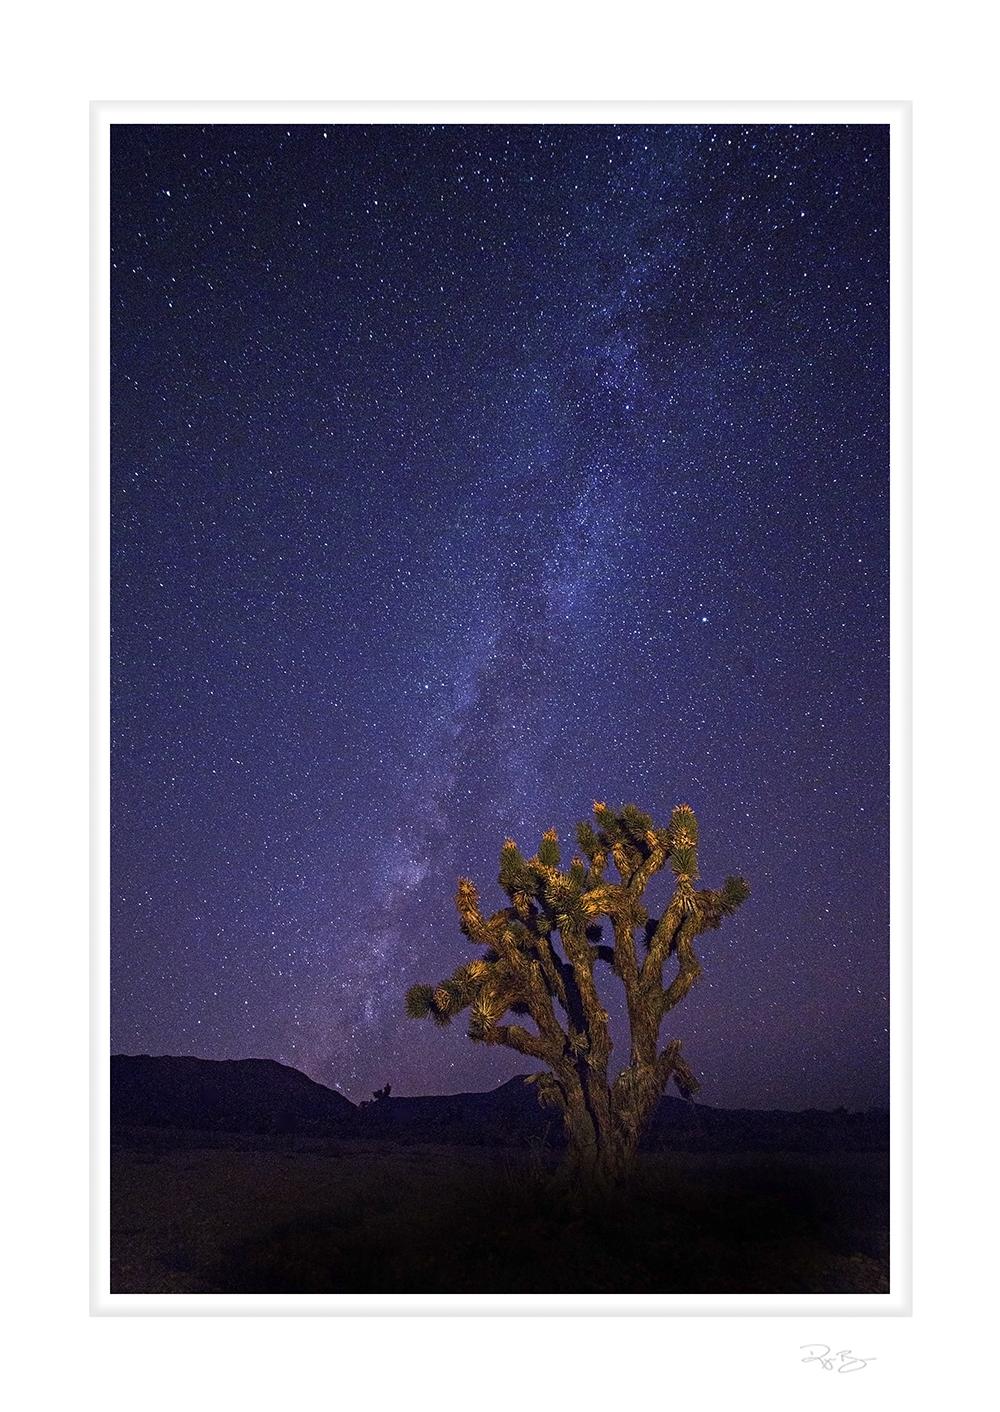 Joshua Tree and the Milky Way ©Ryan Brown 2014